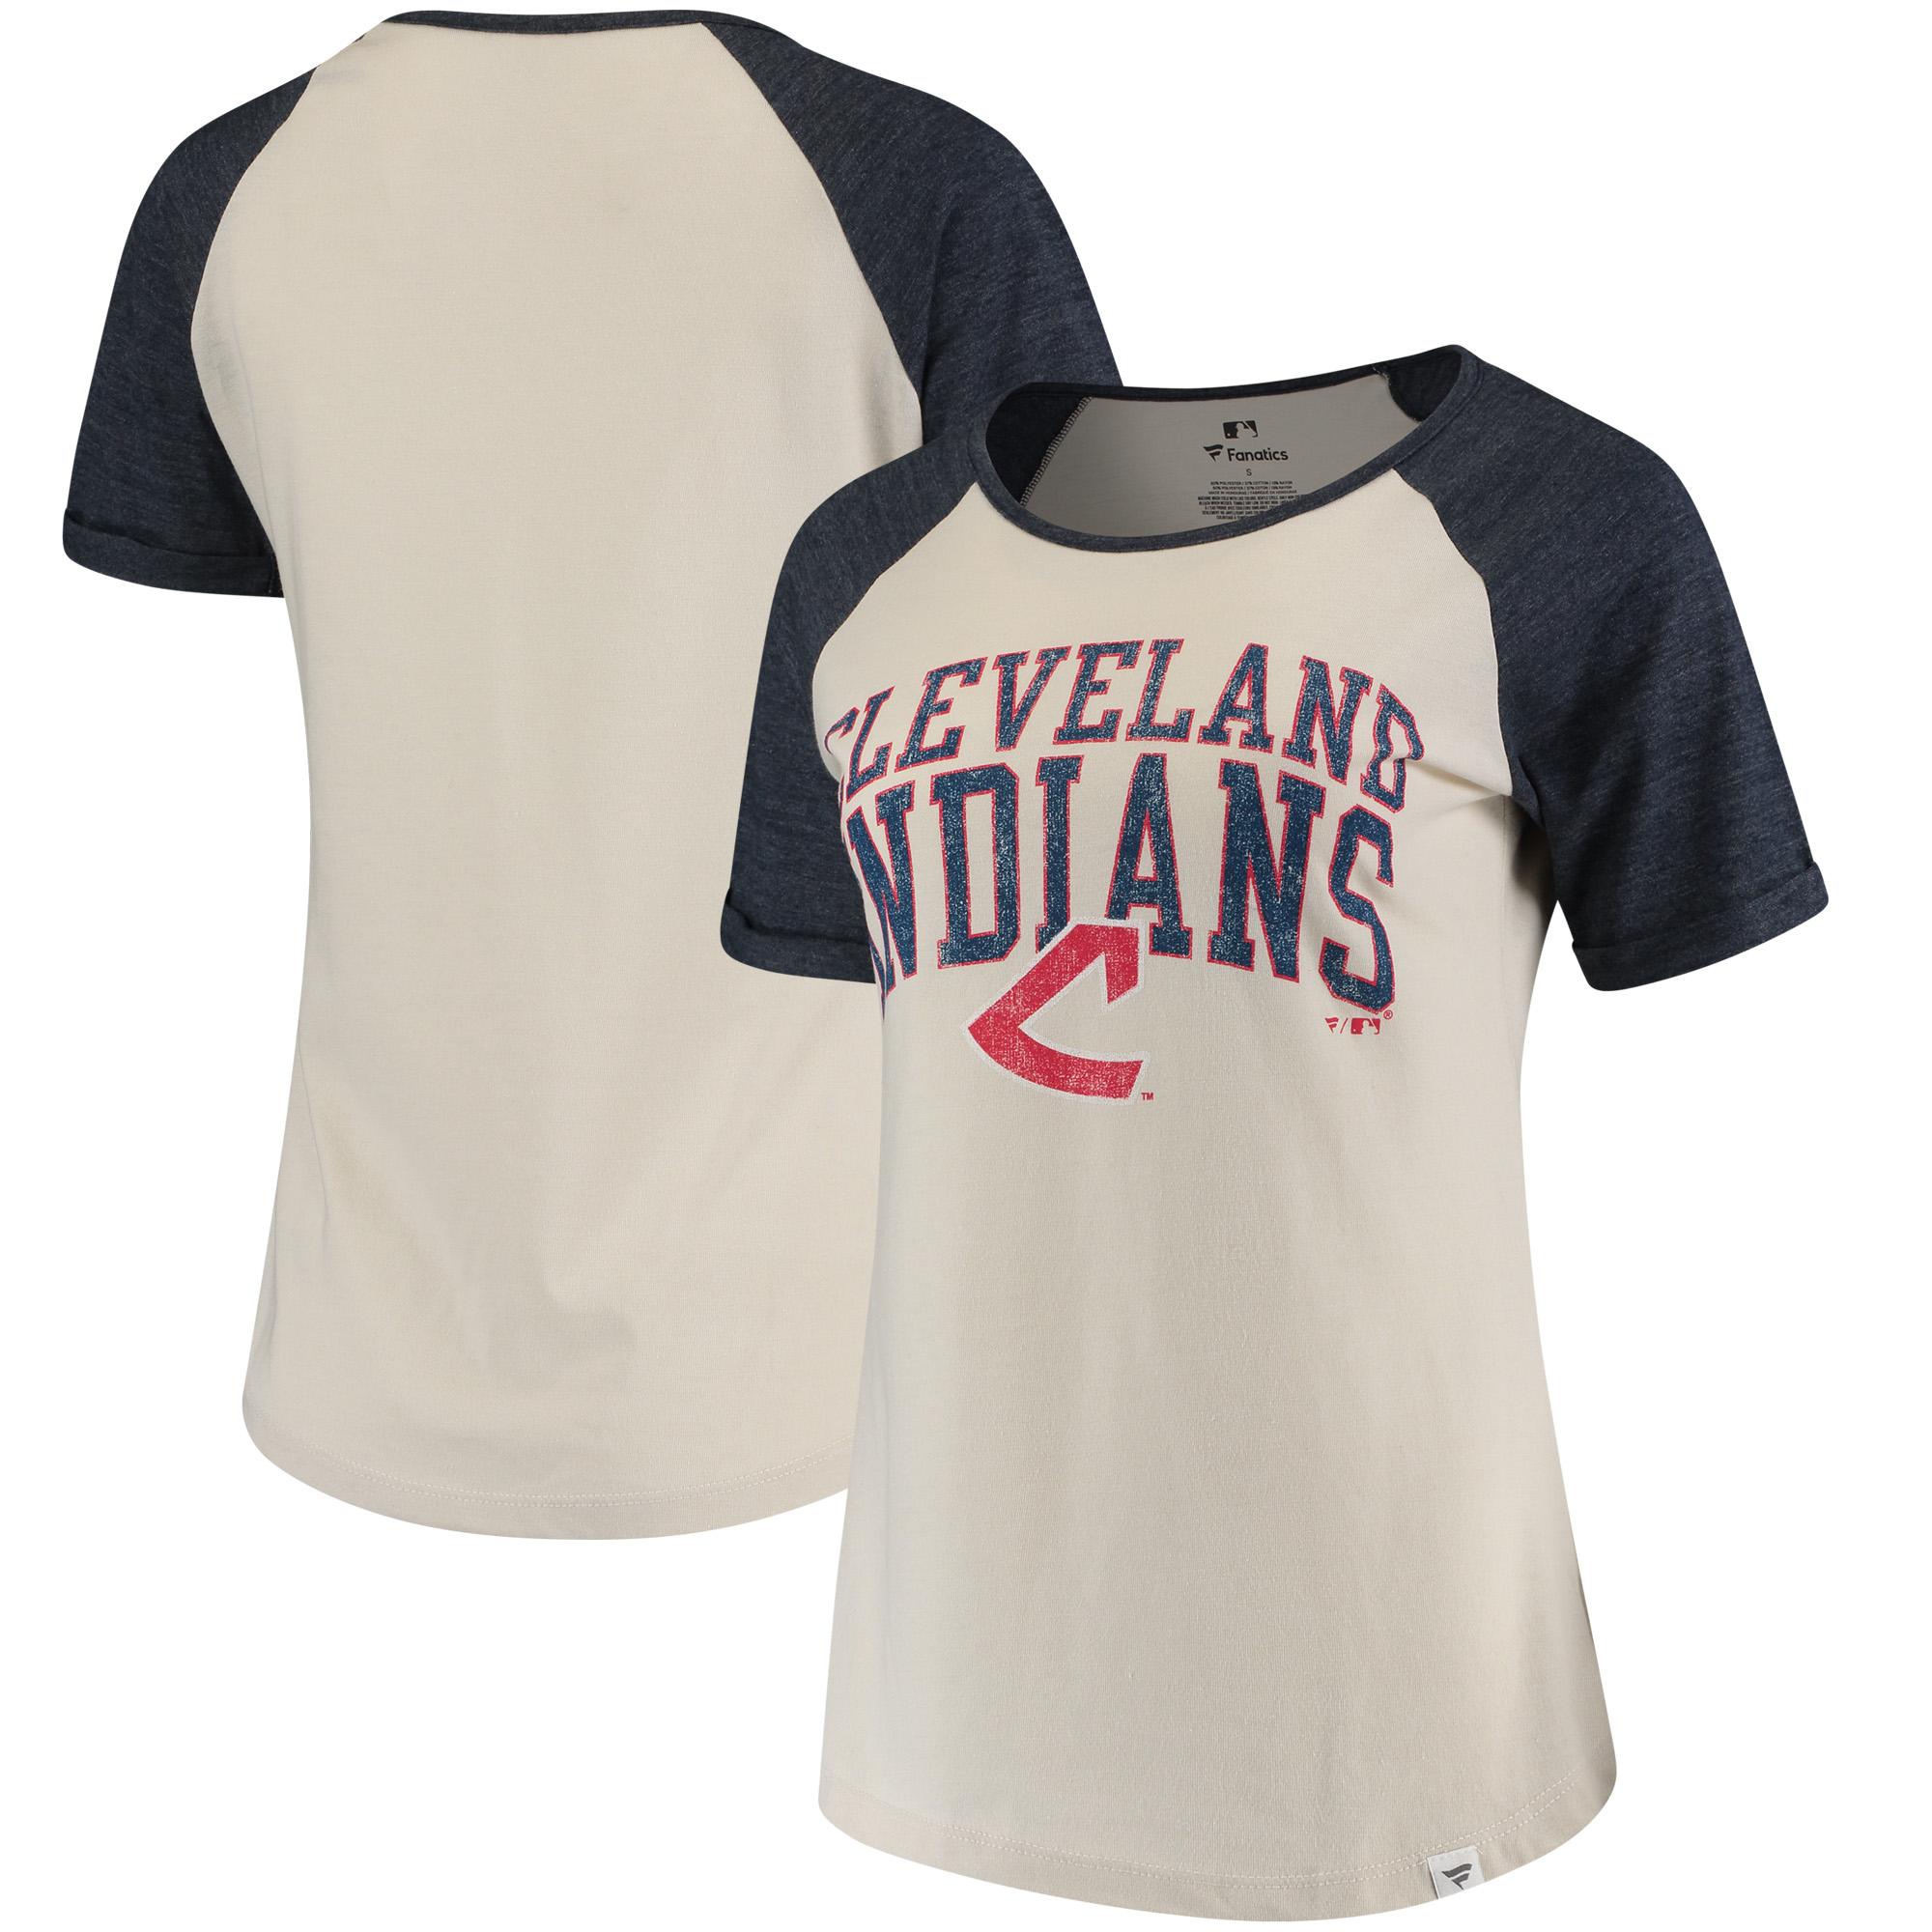 Cleveland Indians Fanatics Branded Women's True Classics Colorblock Raglan Tri-Blend T-Shirt - Cream/Navy